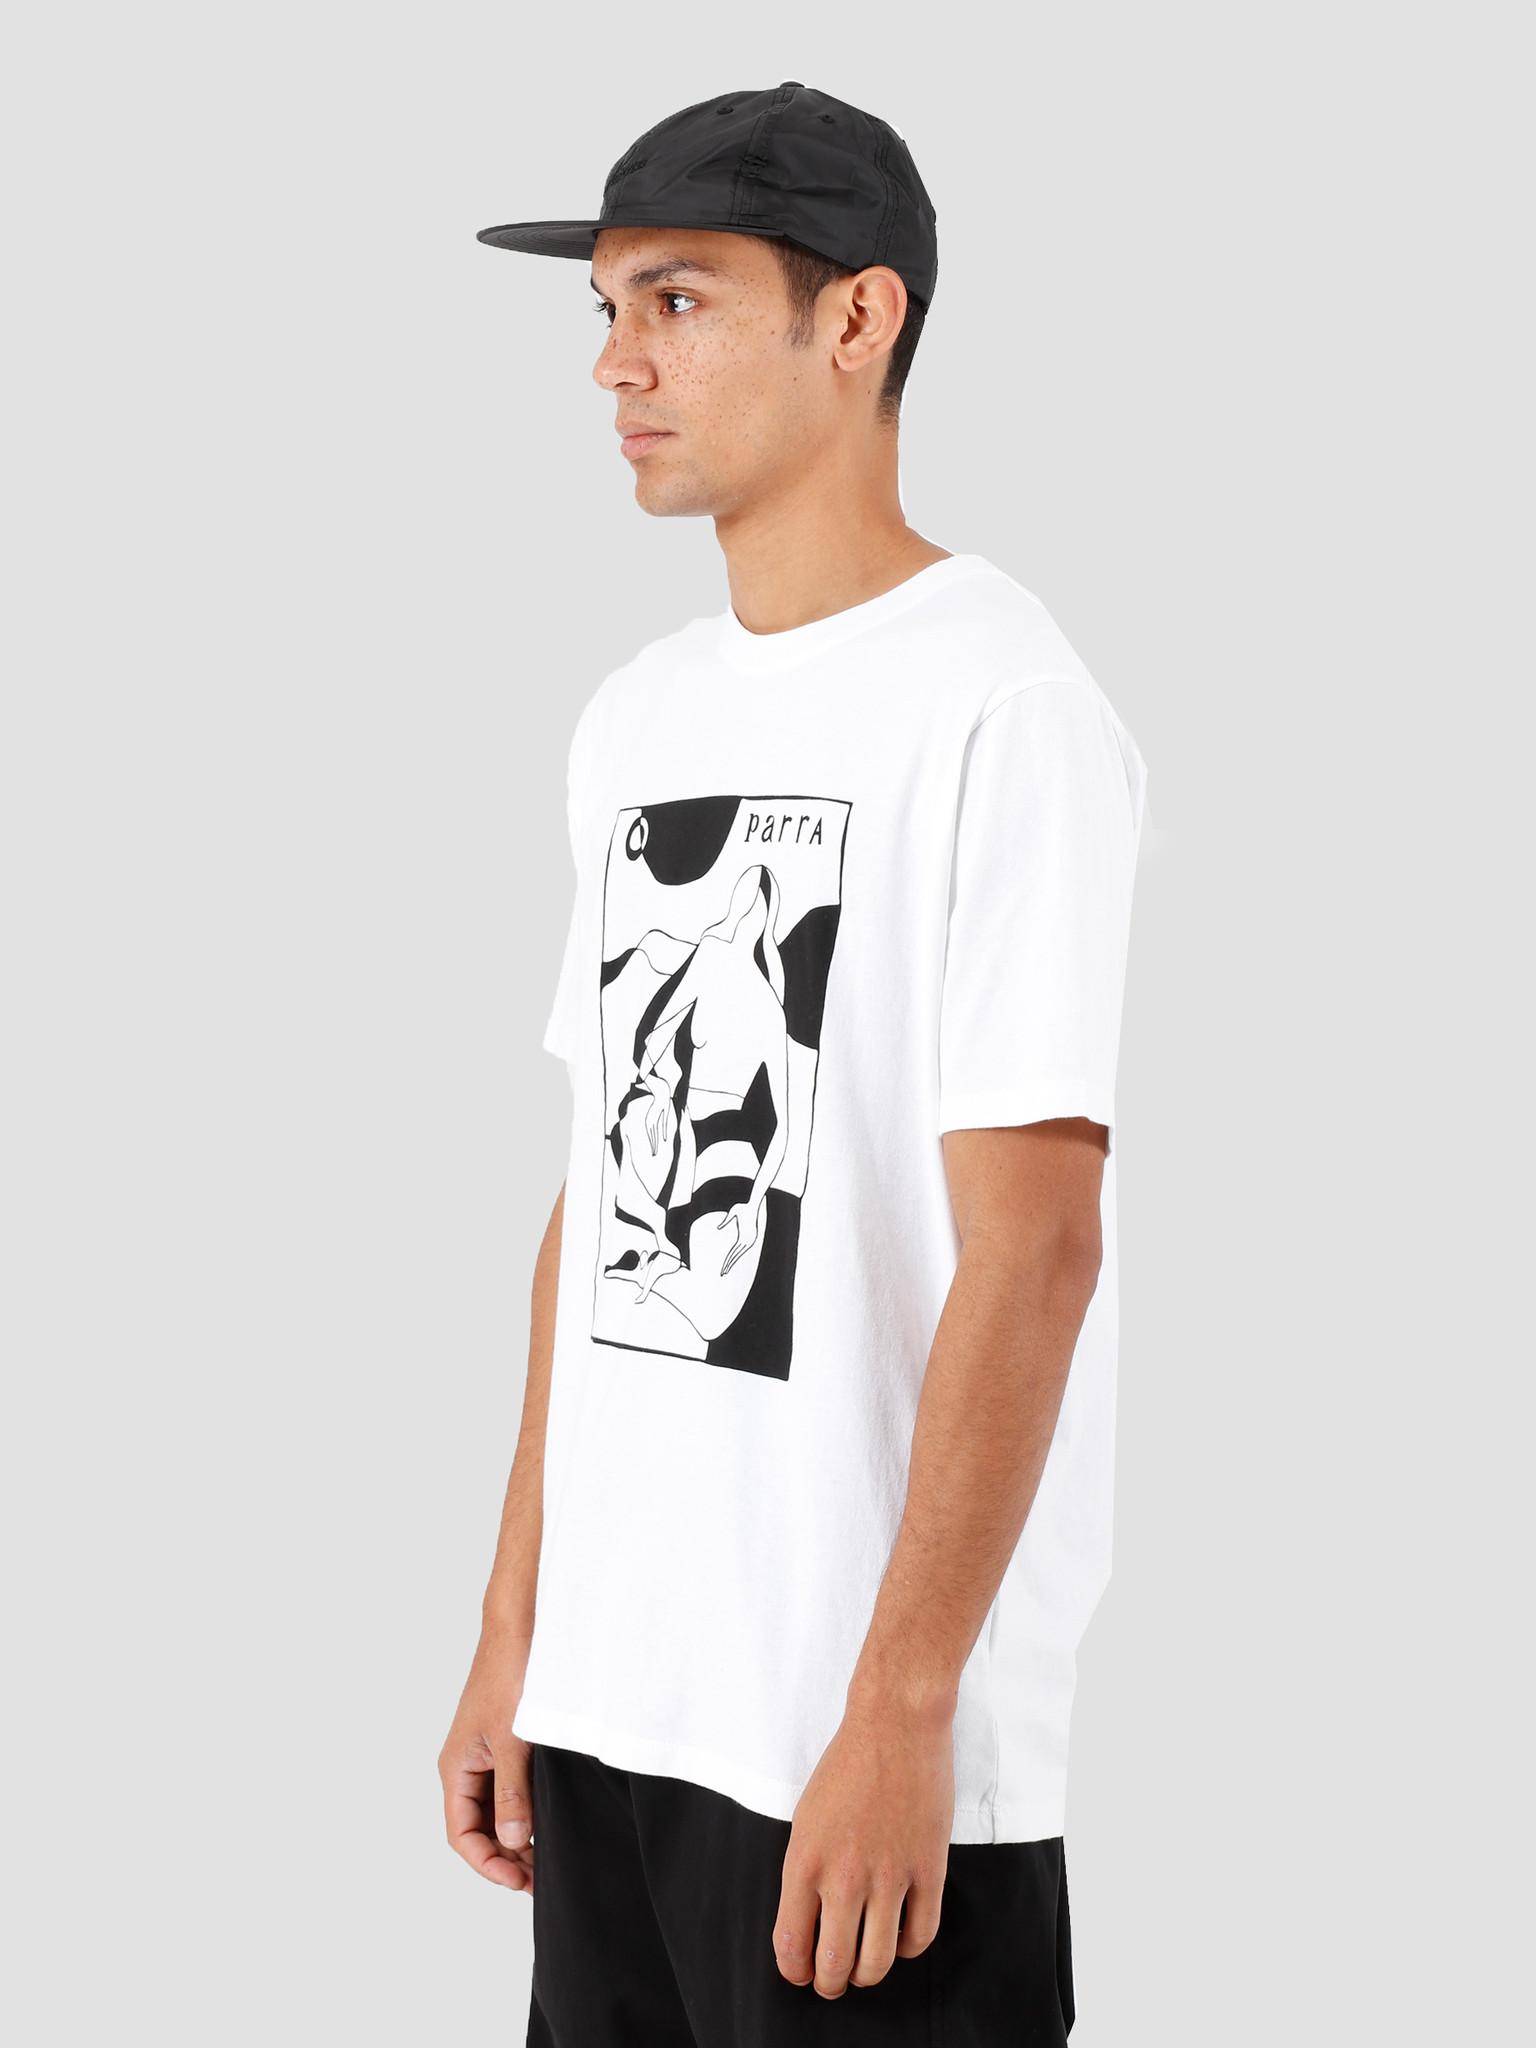 By Parra By Parra ComplicatedBeachSceneT-Shirt White 42970